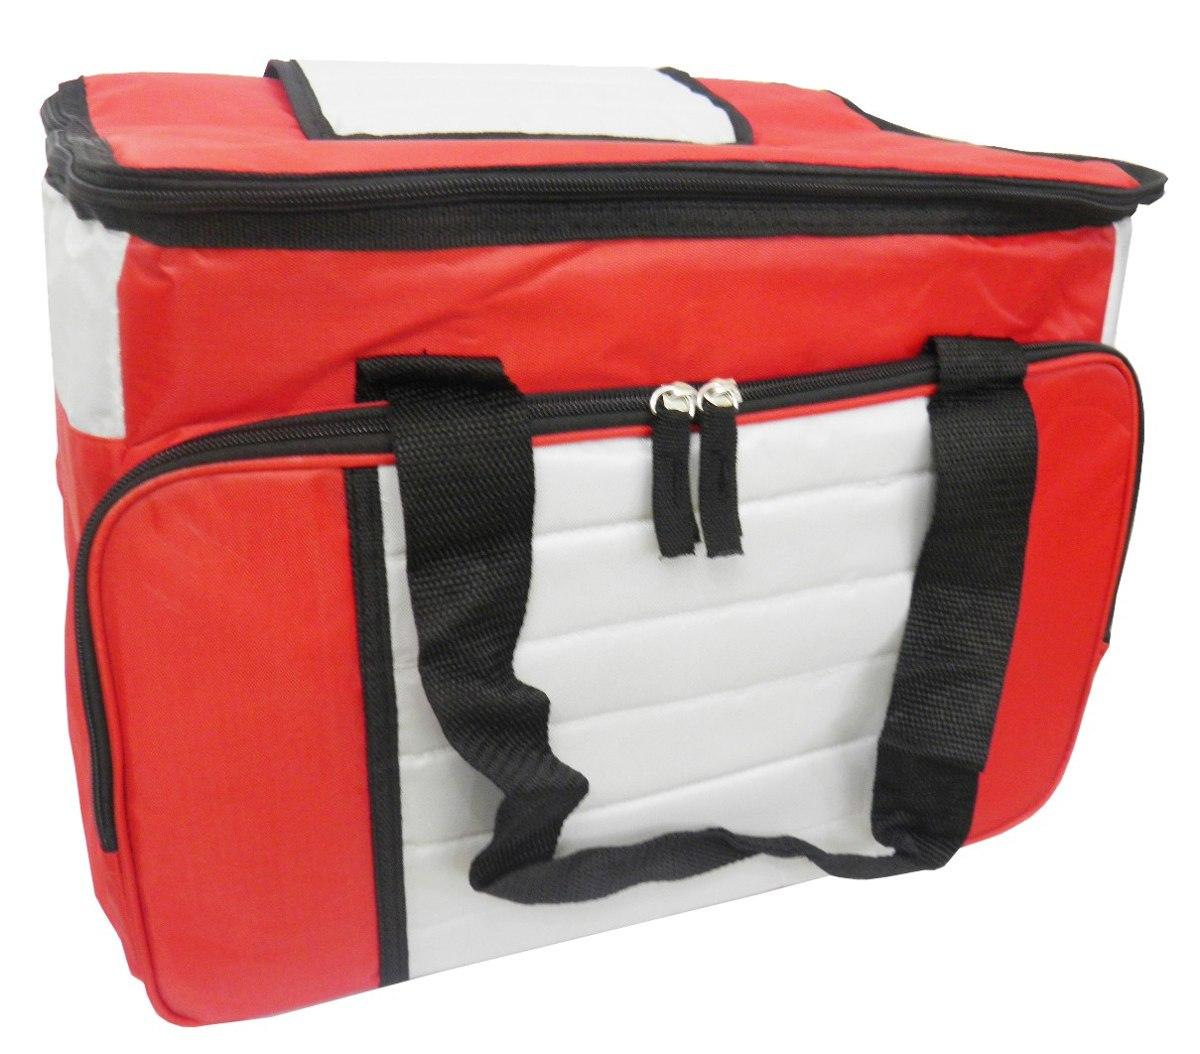 93f0590be bolsa termica 30 litros cooler academia camping fitness. Carregando zoom.